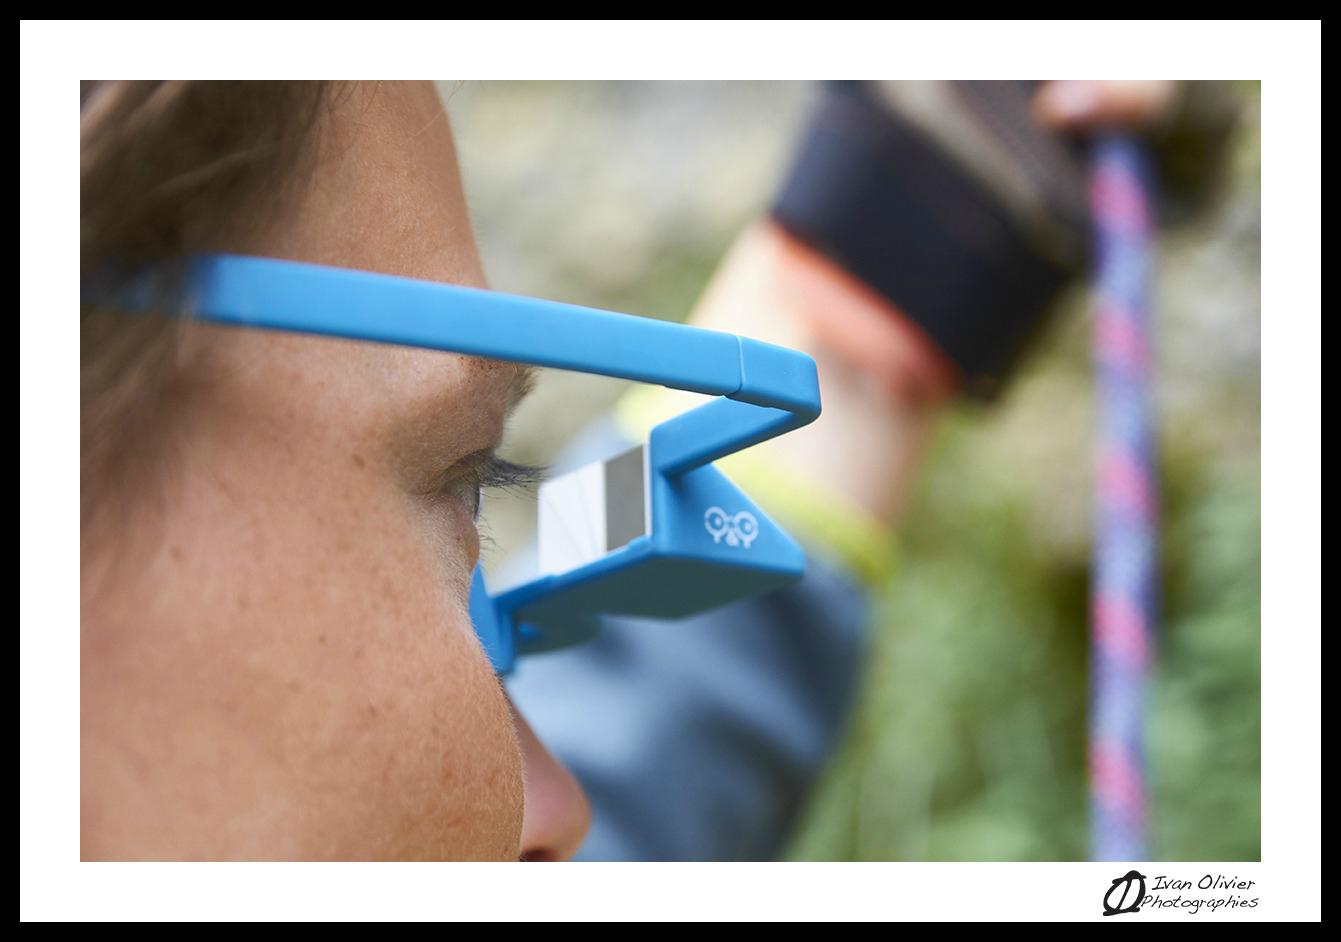 france-lunettes-yy-ivan-olivier-photographie-6